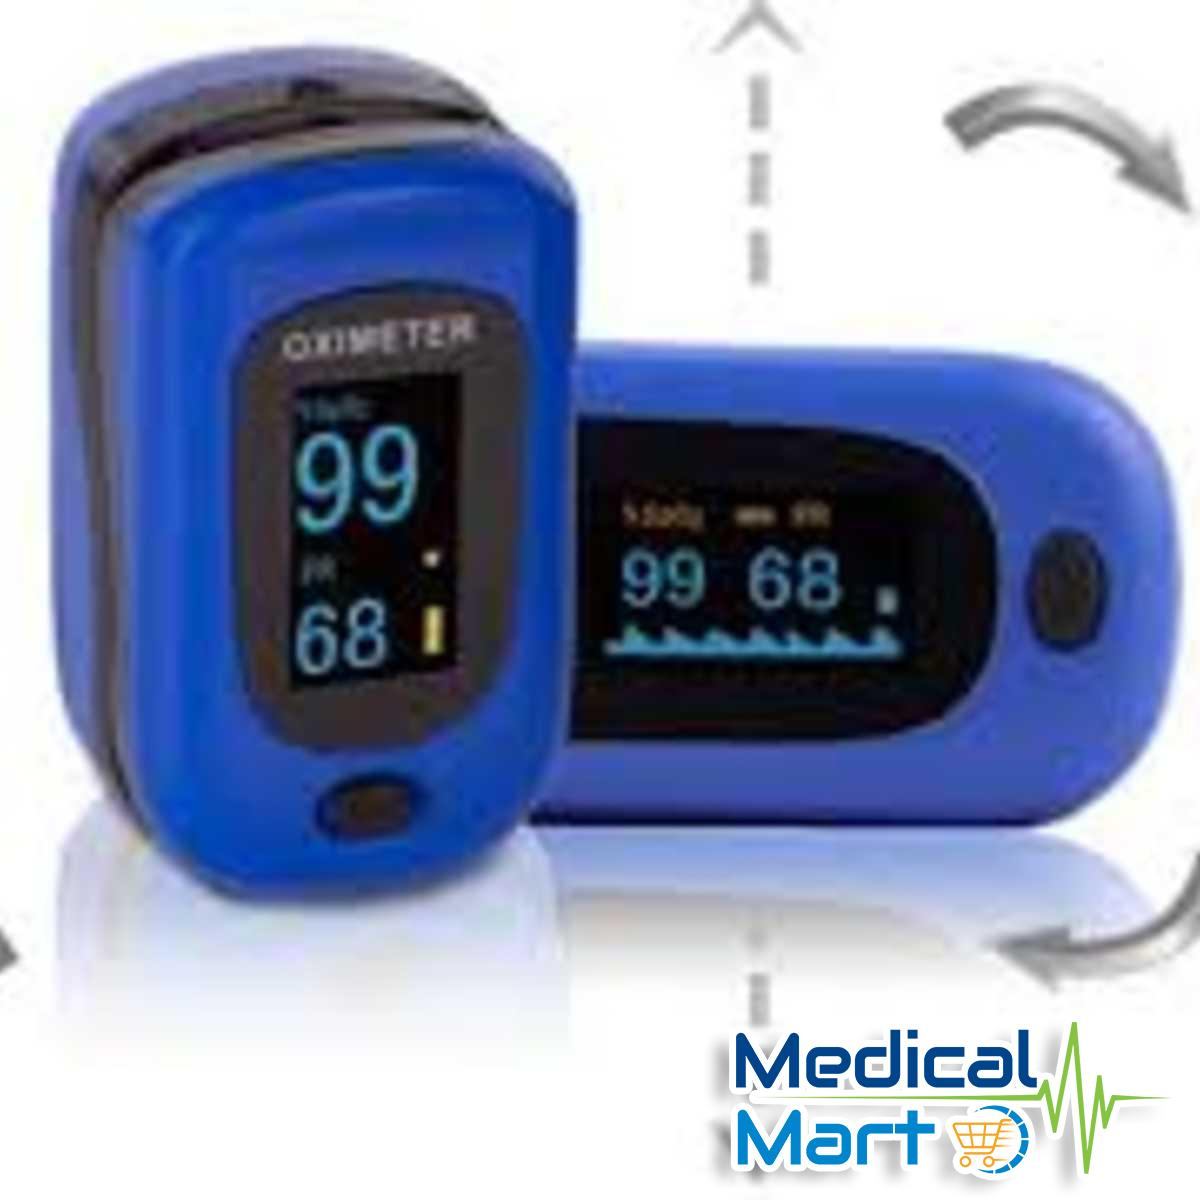 Bromed Pulse Oximeter